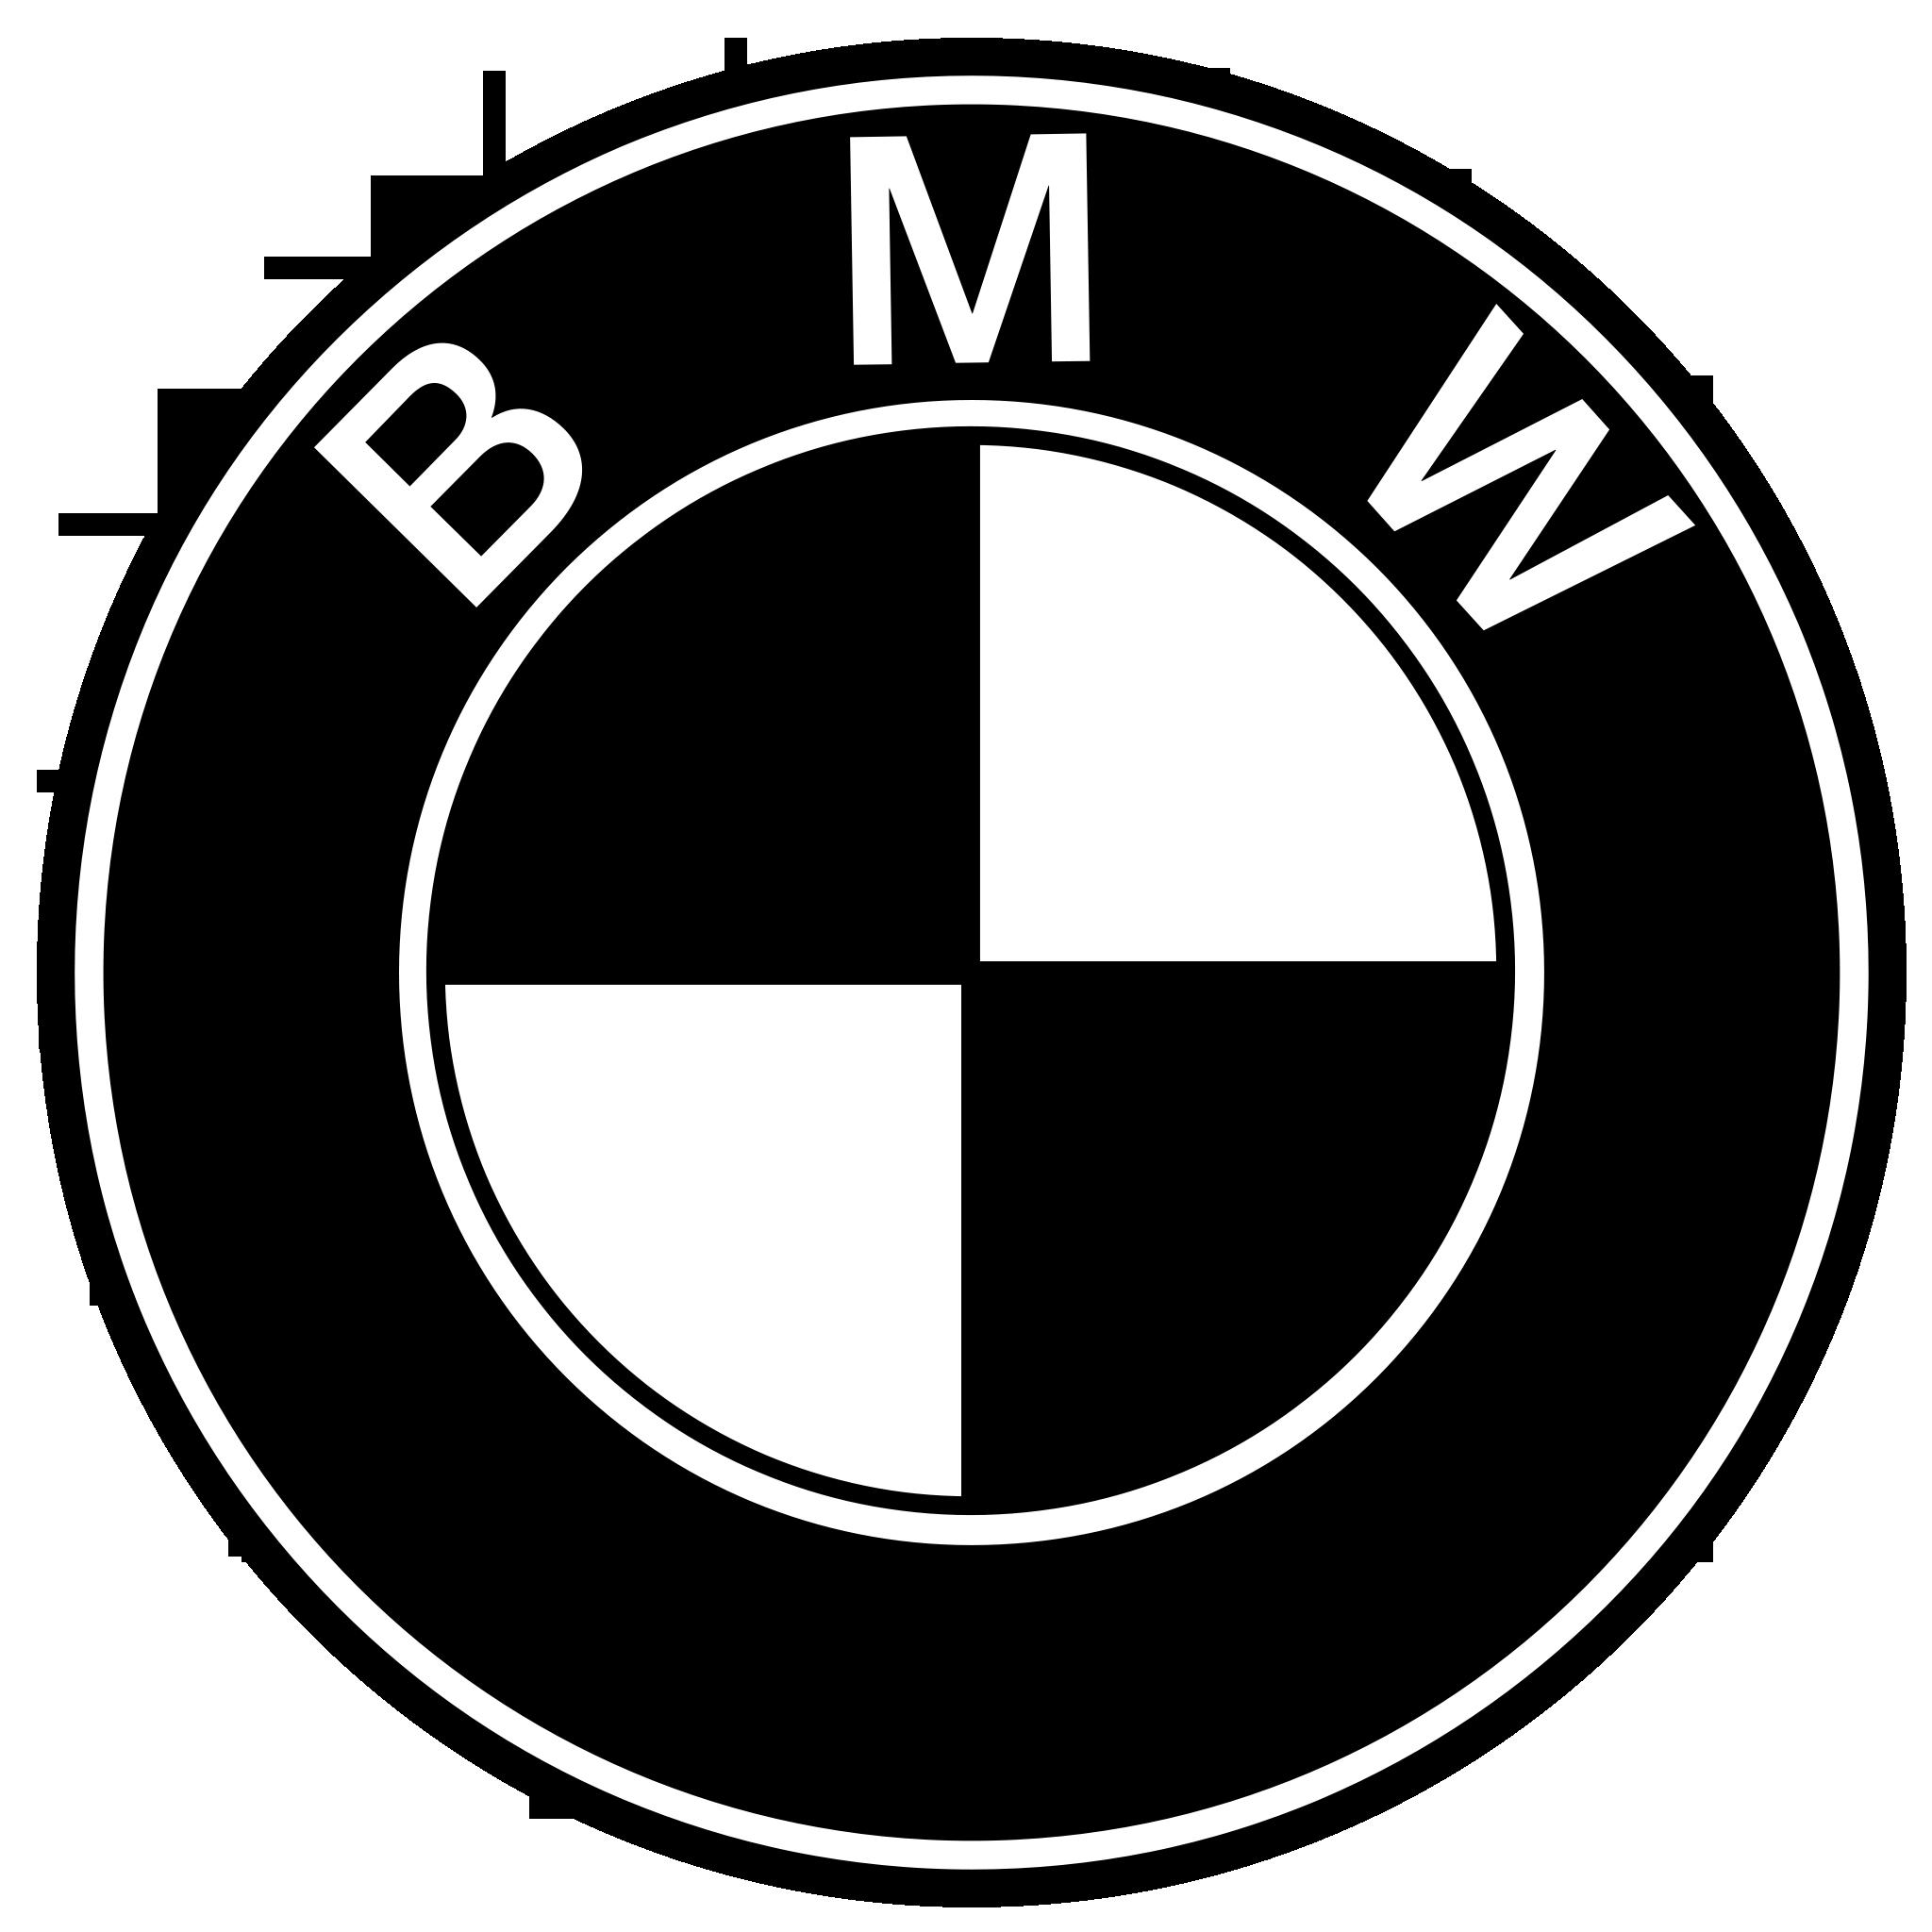 лого бмв картинки